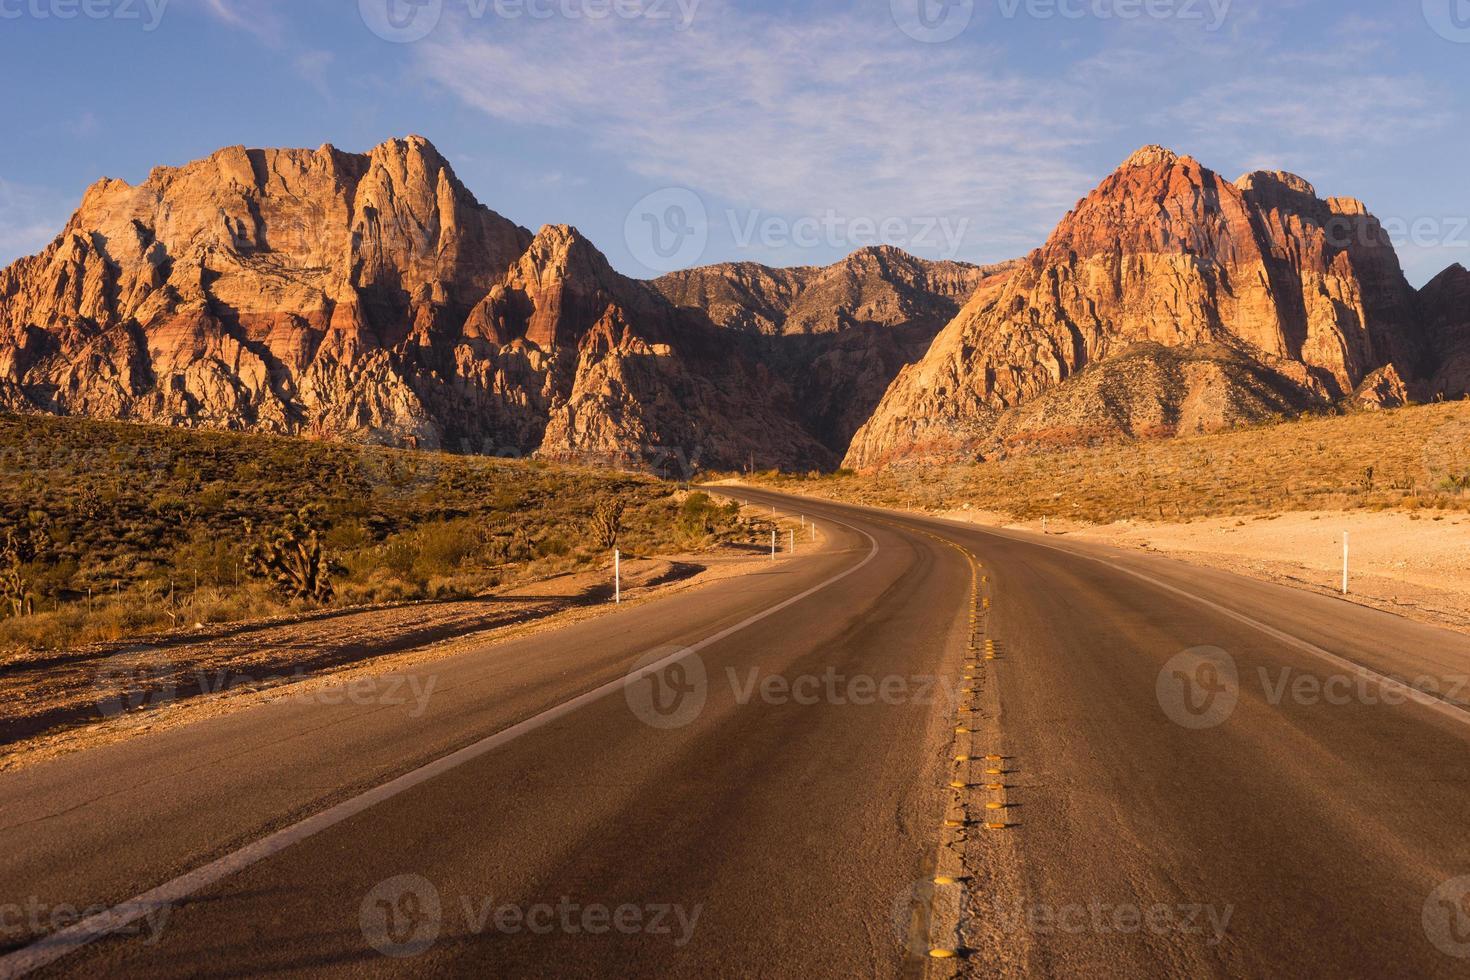 autostrada a due corsie red rock canyon las vegas usa foto